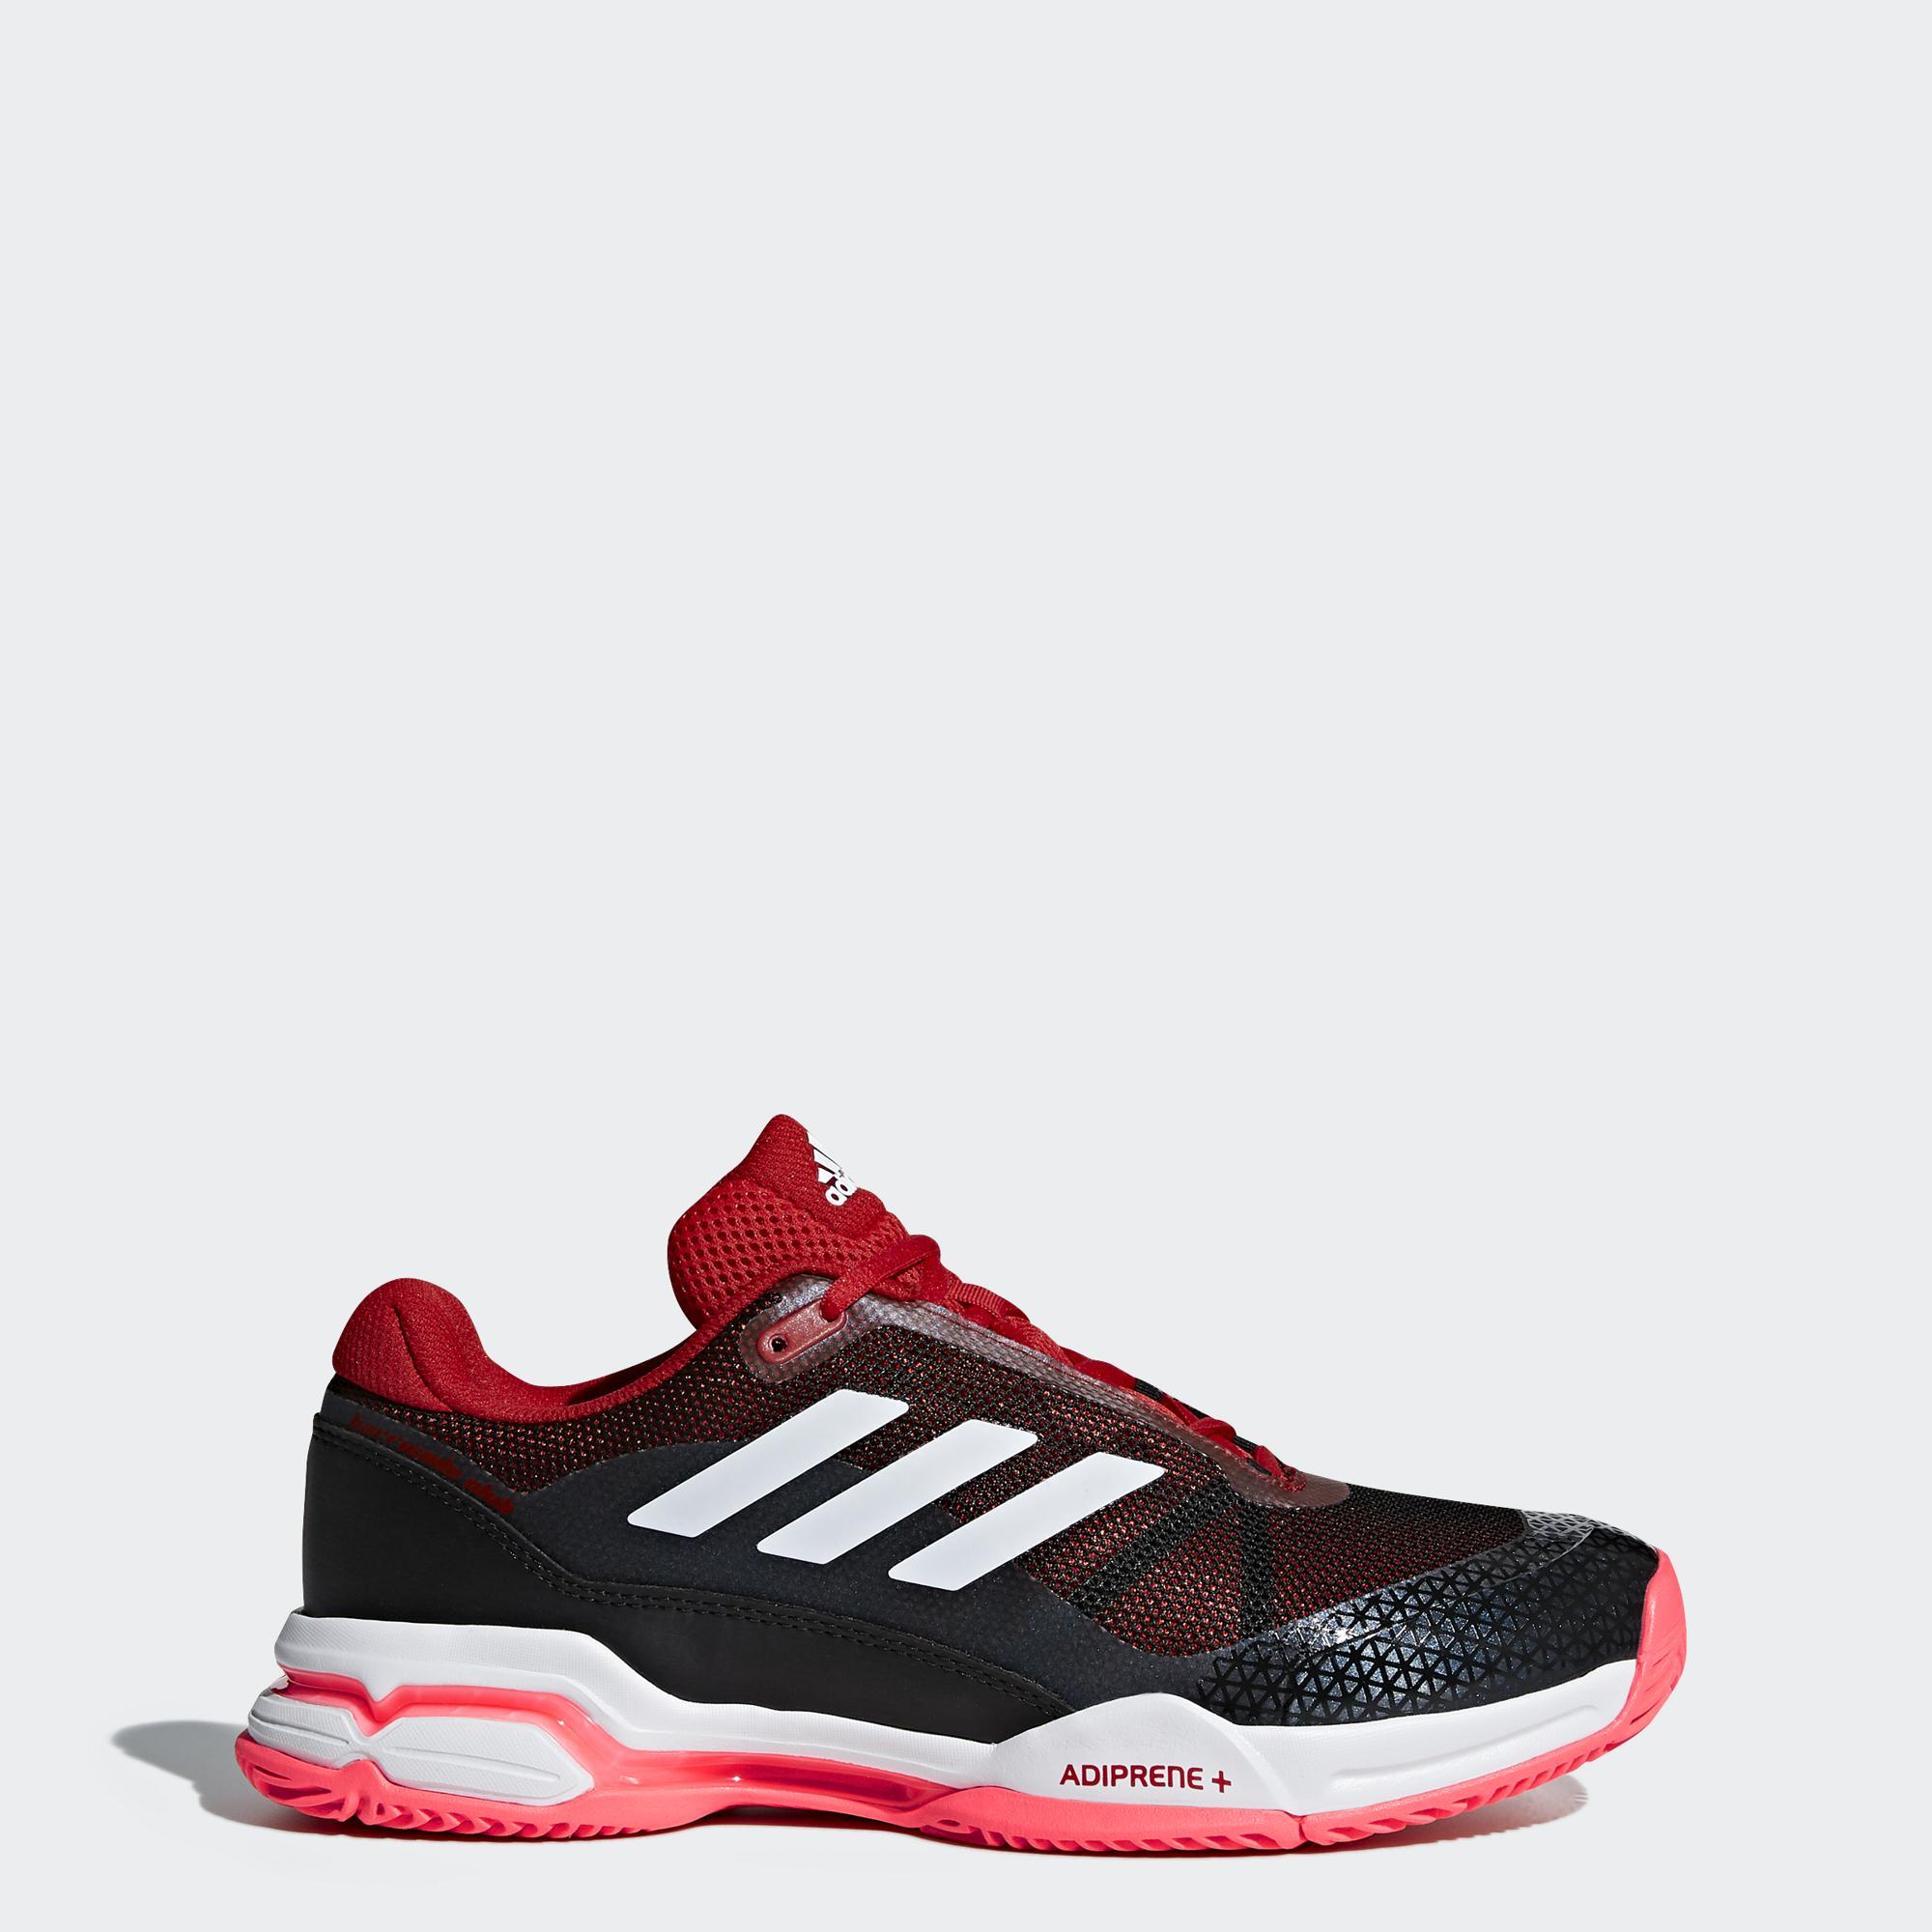 sneakers for cheap 93104 ab094 Adidas Mens Barricade Club Tennis Shoes - Red White Black - Tennisnuts.com